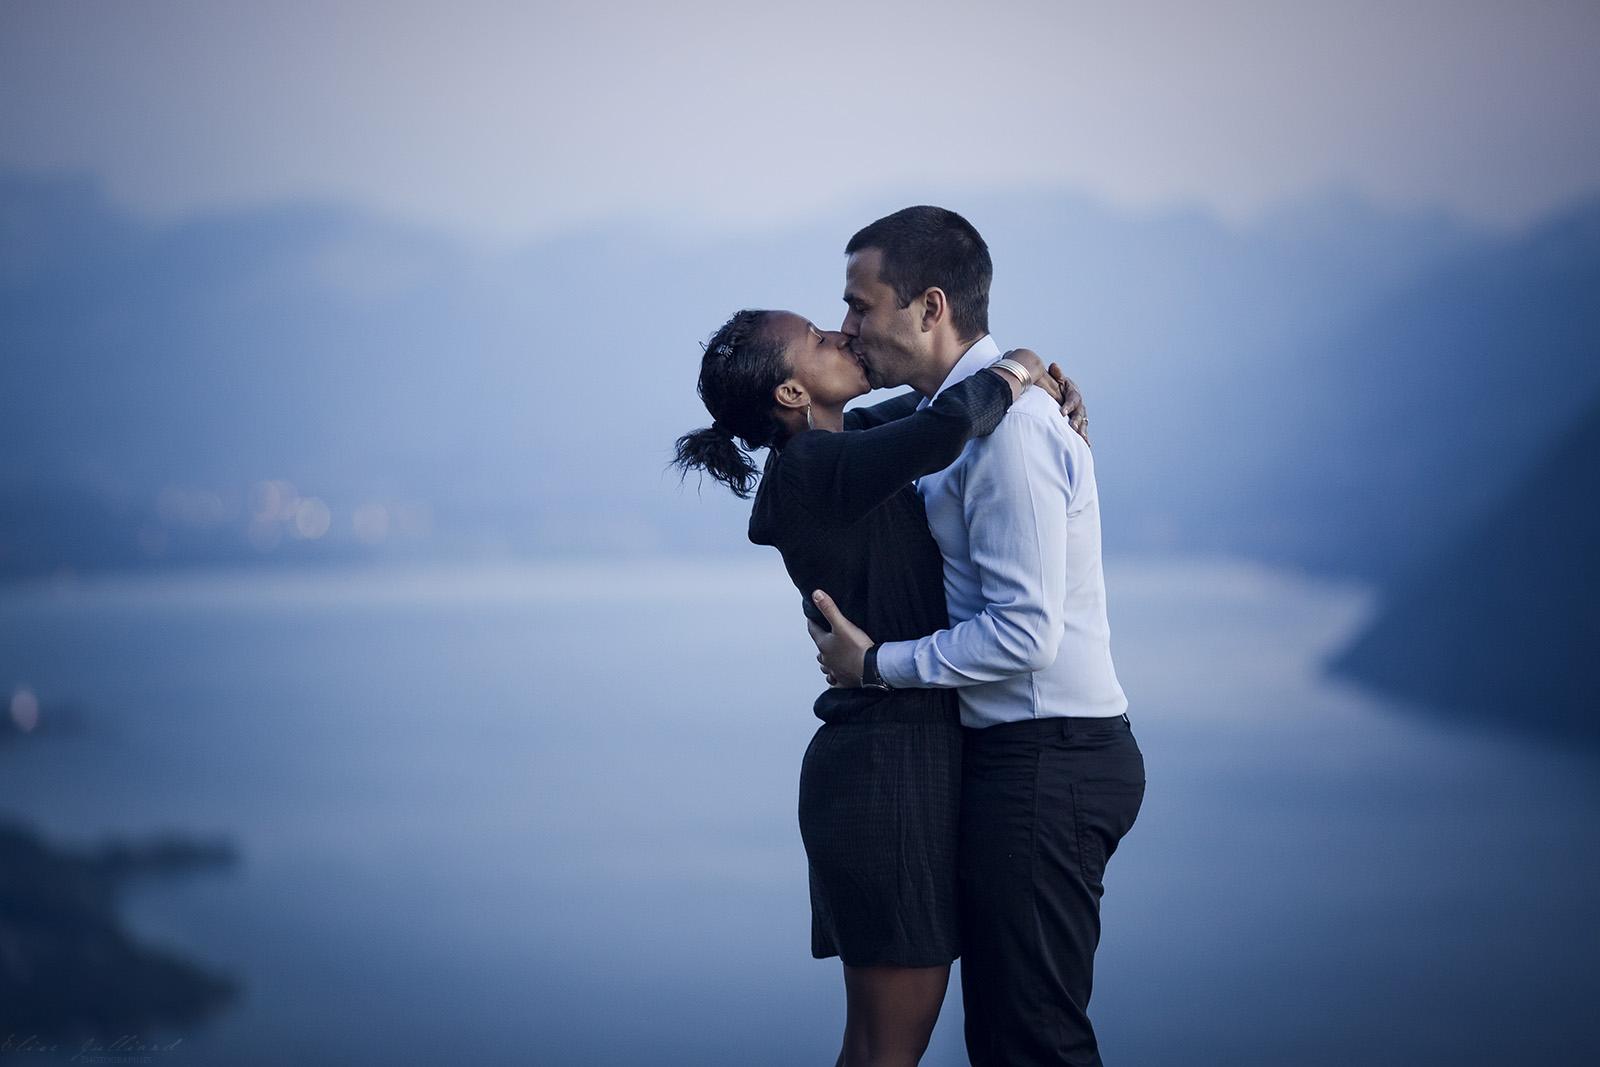 elise-julliard-photographe-lyon-rhone-alpes-mariage-amour-seance-photo-engagement-couple-love-session-wedding-lac-du-bourget-chambery-8